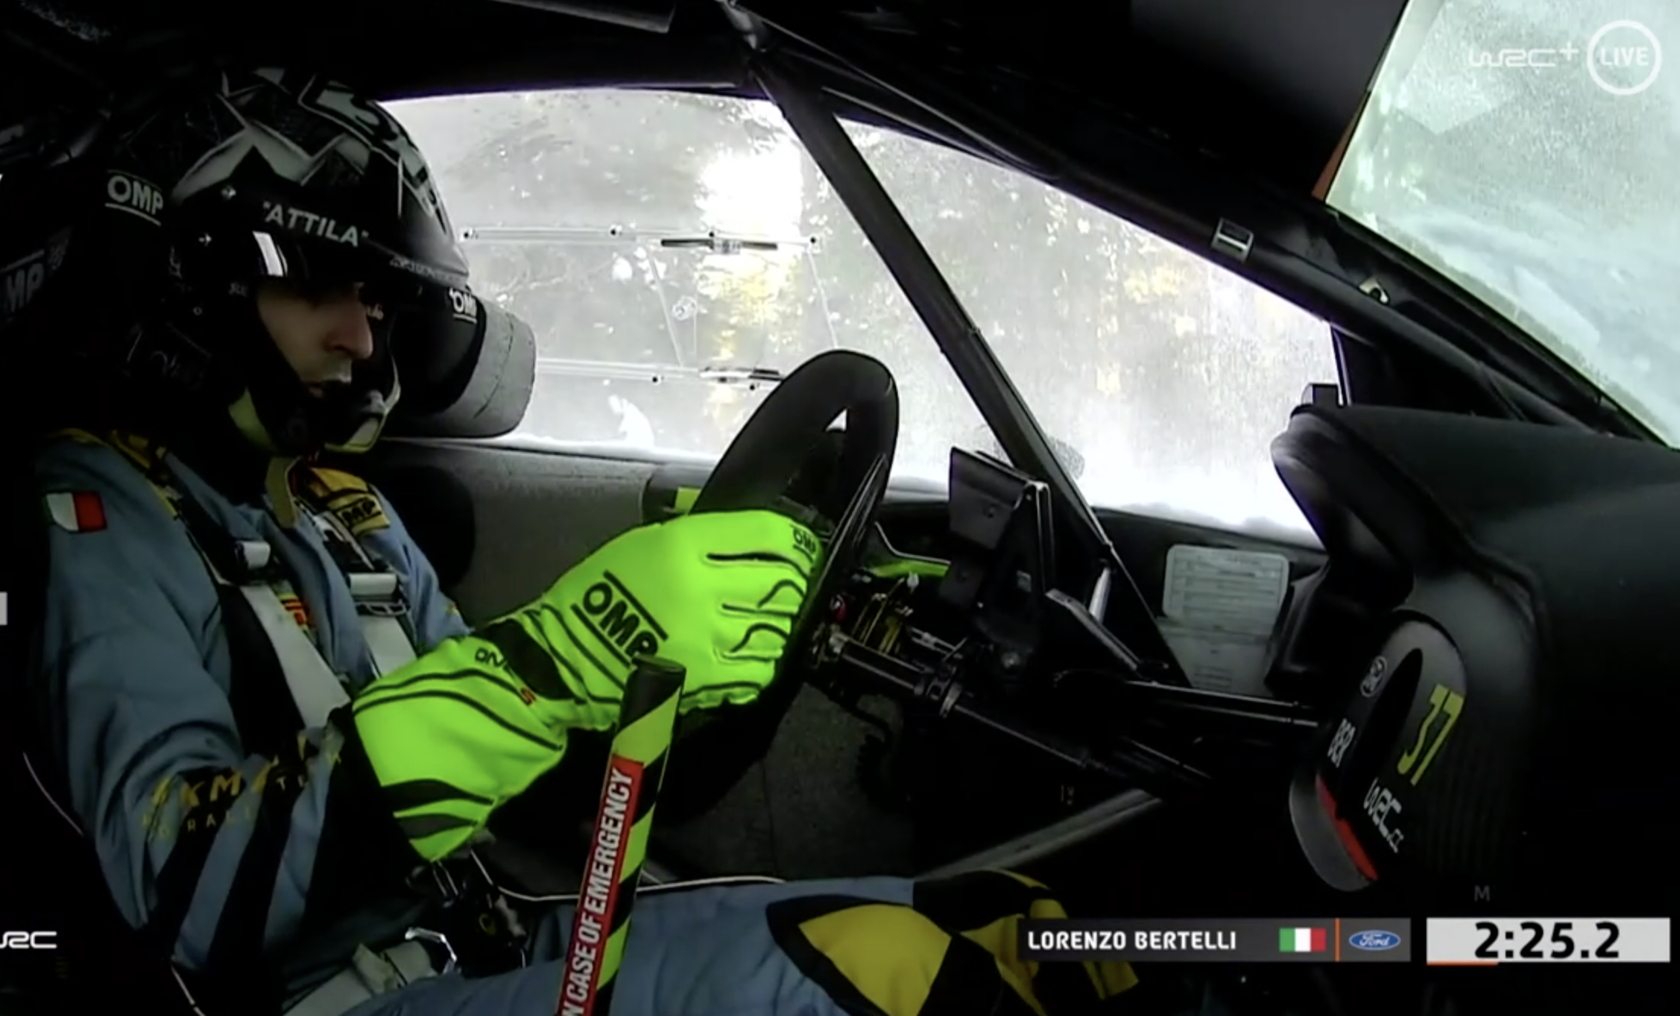 Сход: Лоренцо Бертелли, Ford Fiesta WRC, Arctic Rally Finland 2021